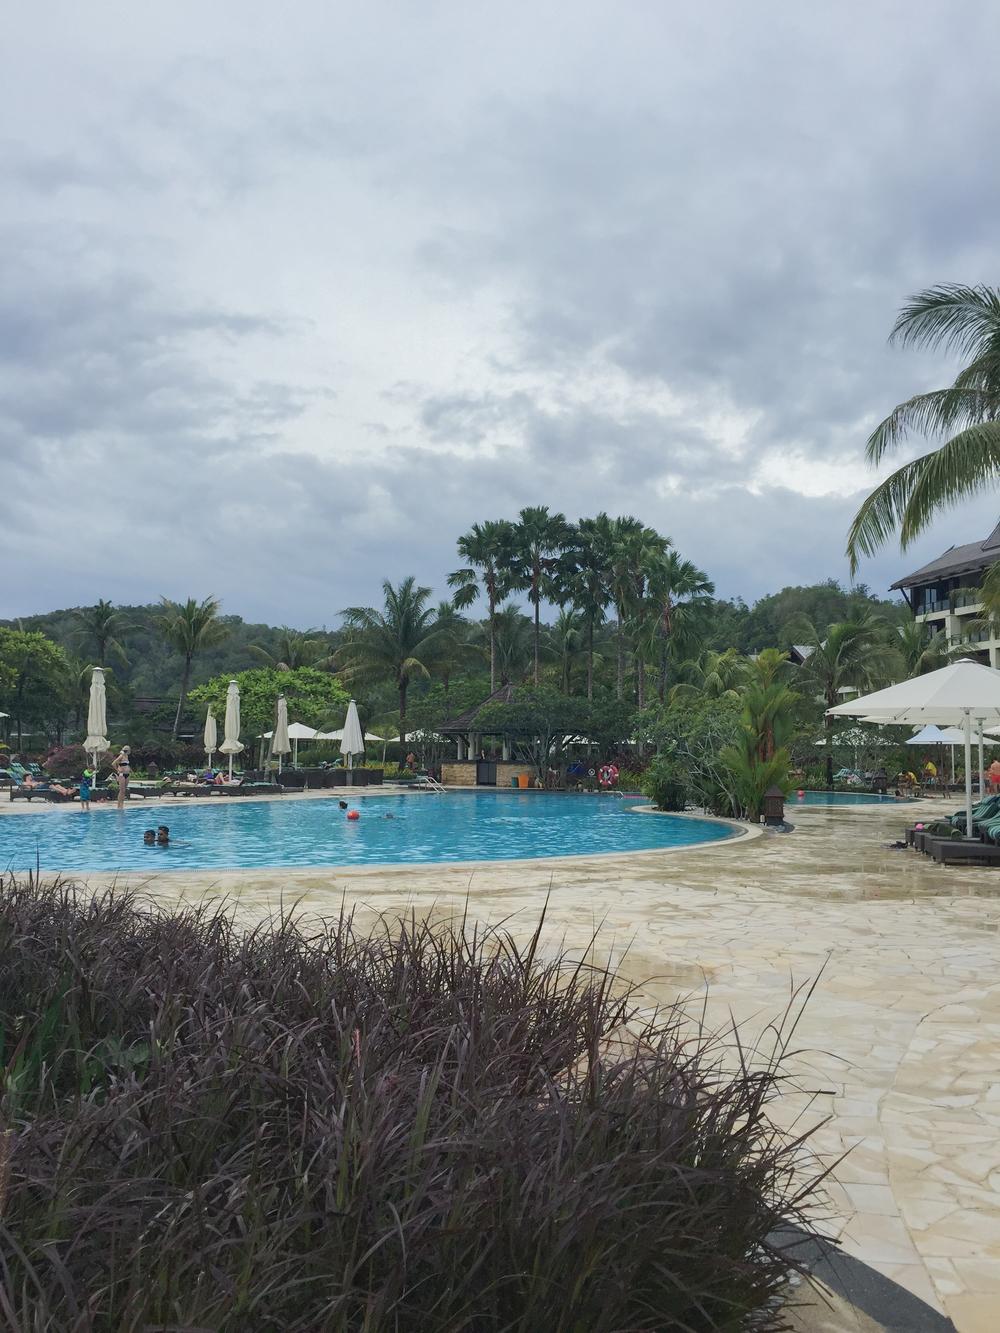 Shangri La Rasa Ria Resort Borneo Malaysia Kota Kinabalu (18 of 23).JPG